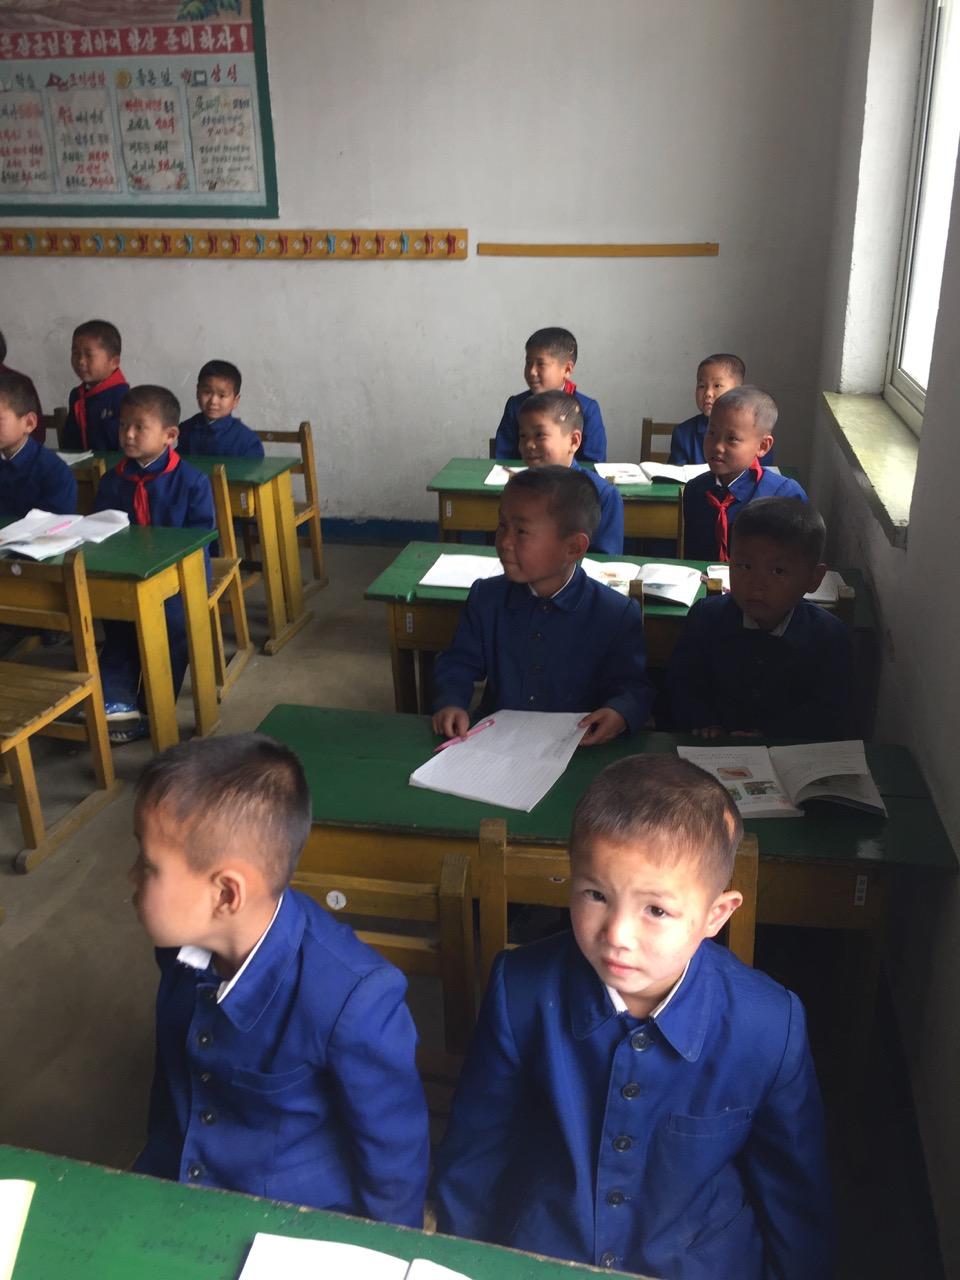 Classroom in the Haeju School